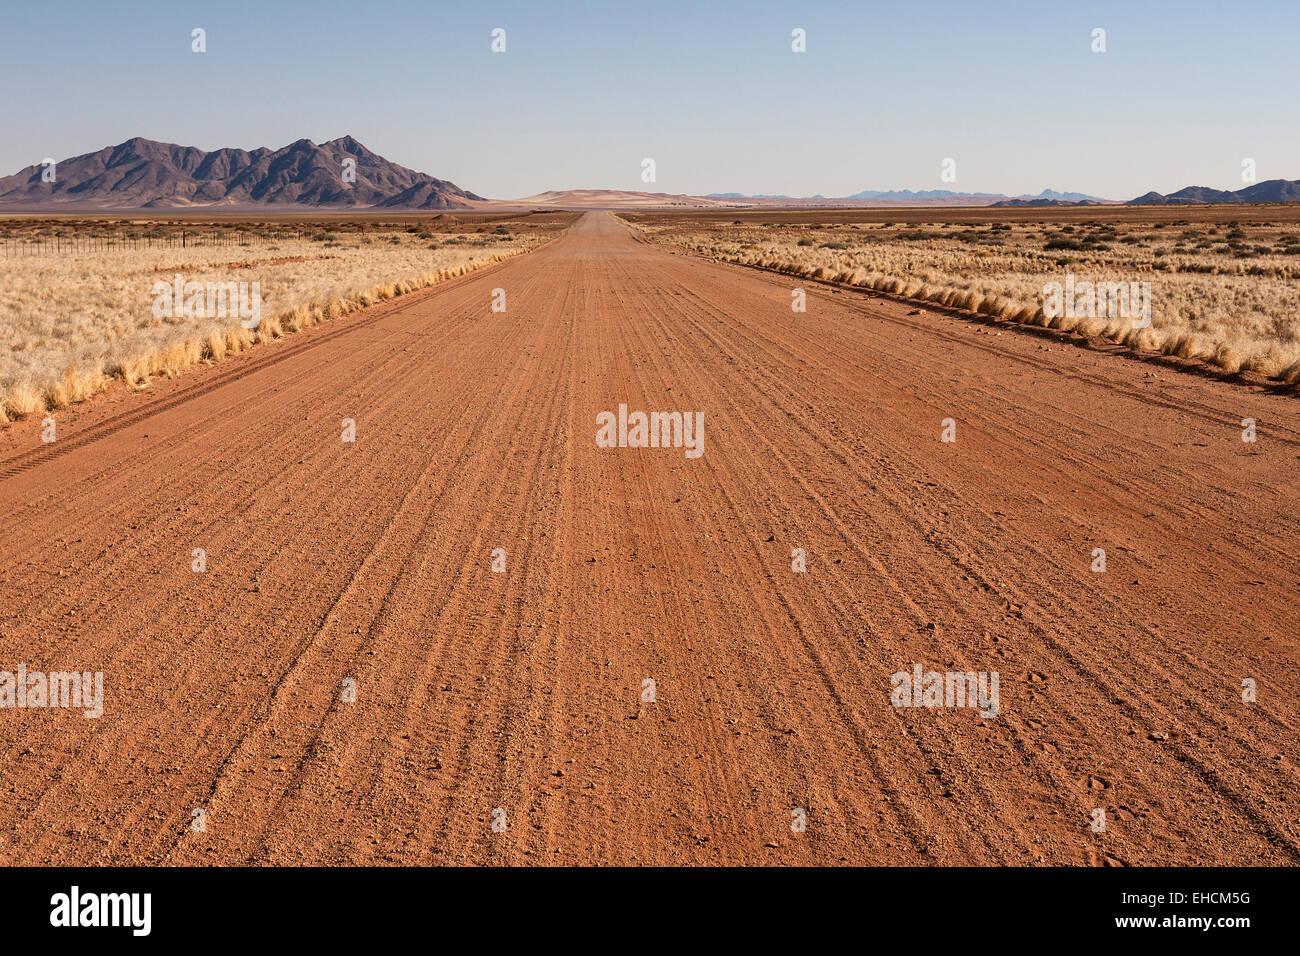 Pad D707, road along the Namib Desert, Namib Naukluft Park, Namibia - Stock Image